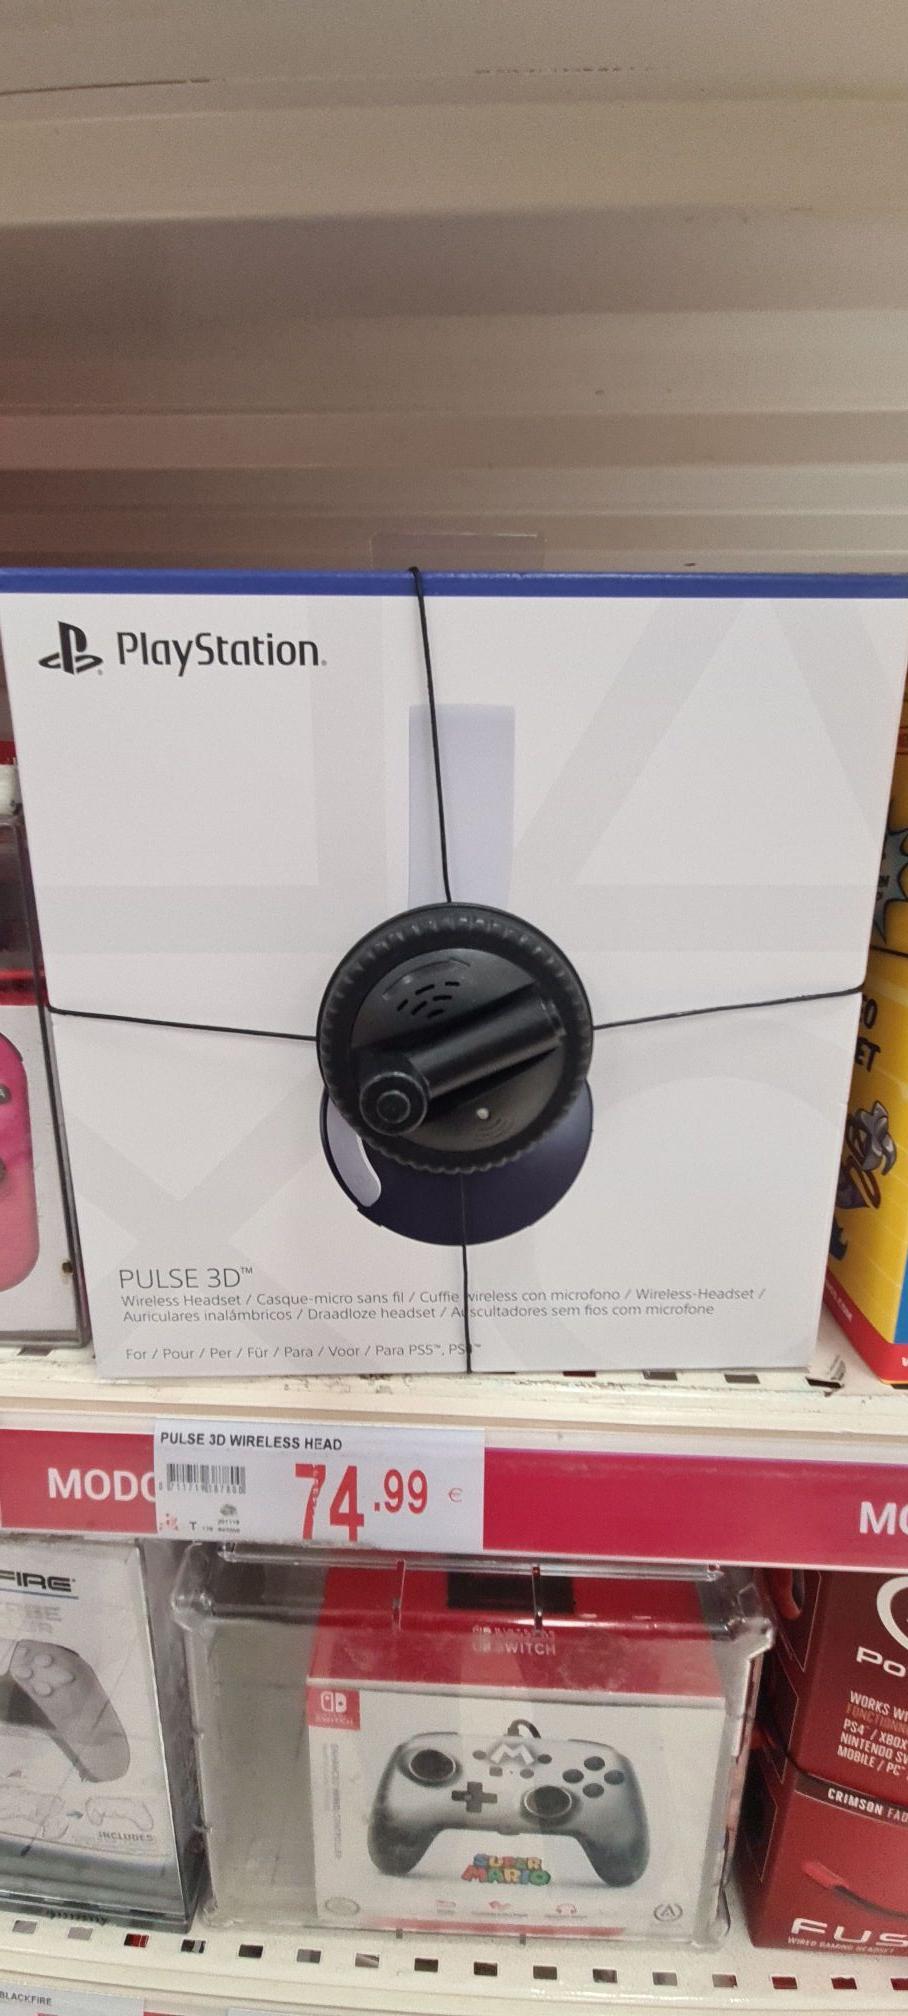 Auriculares Pulse 3d playstation